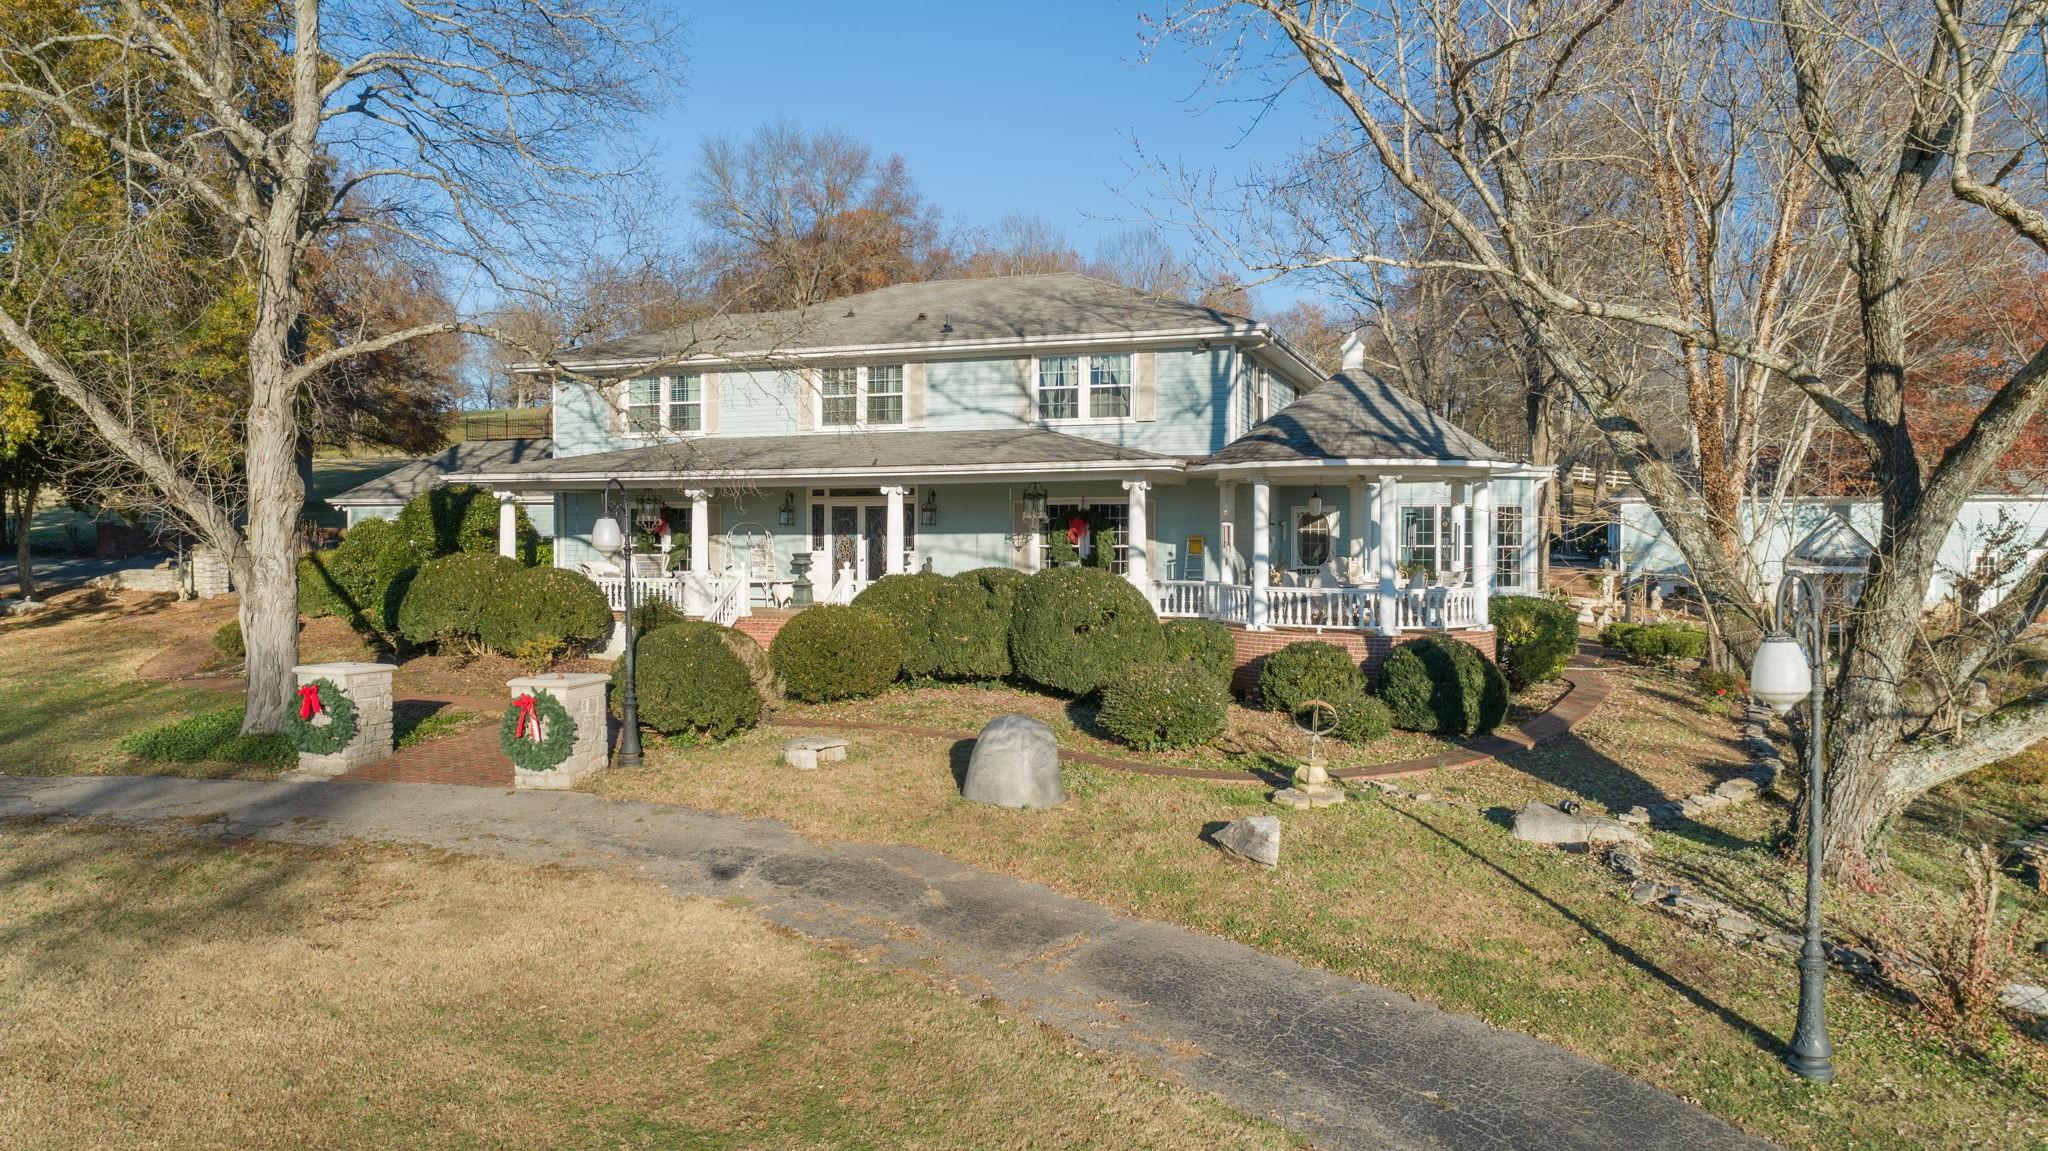 1411 Hwy Tn-82 Property Photo 1